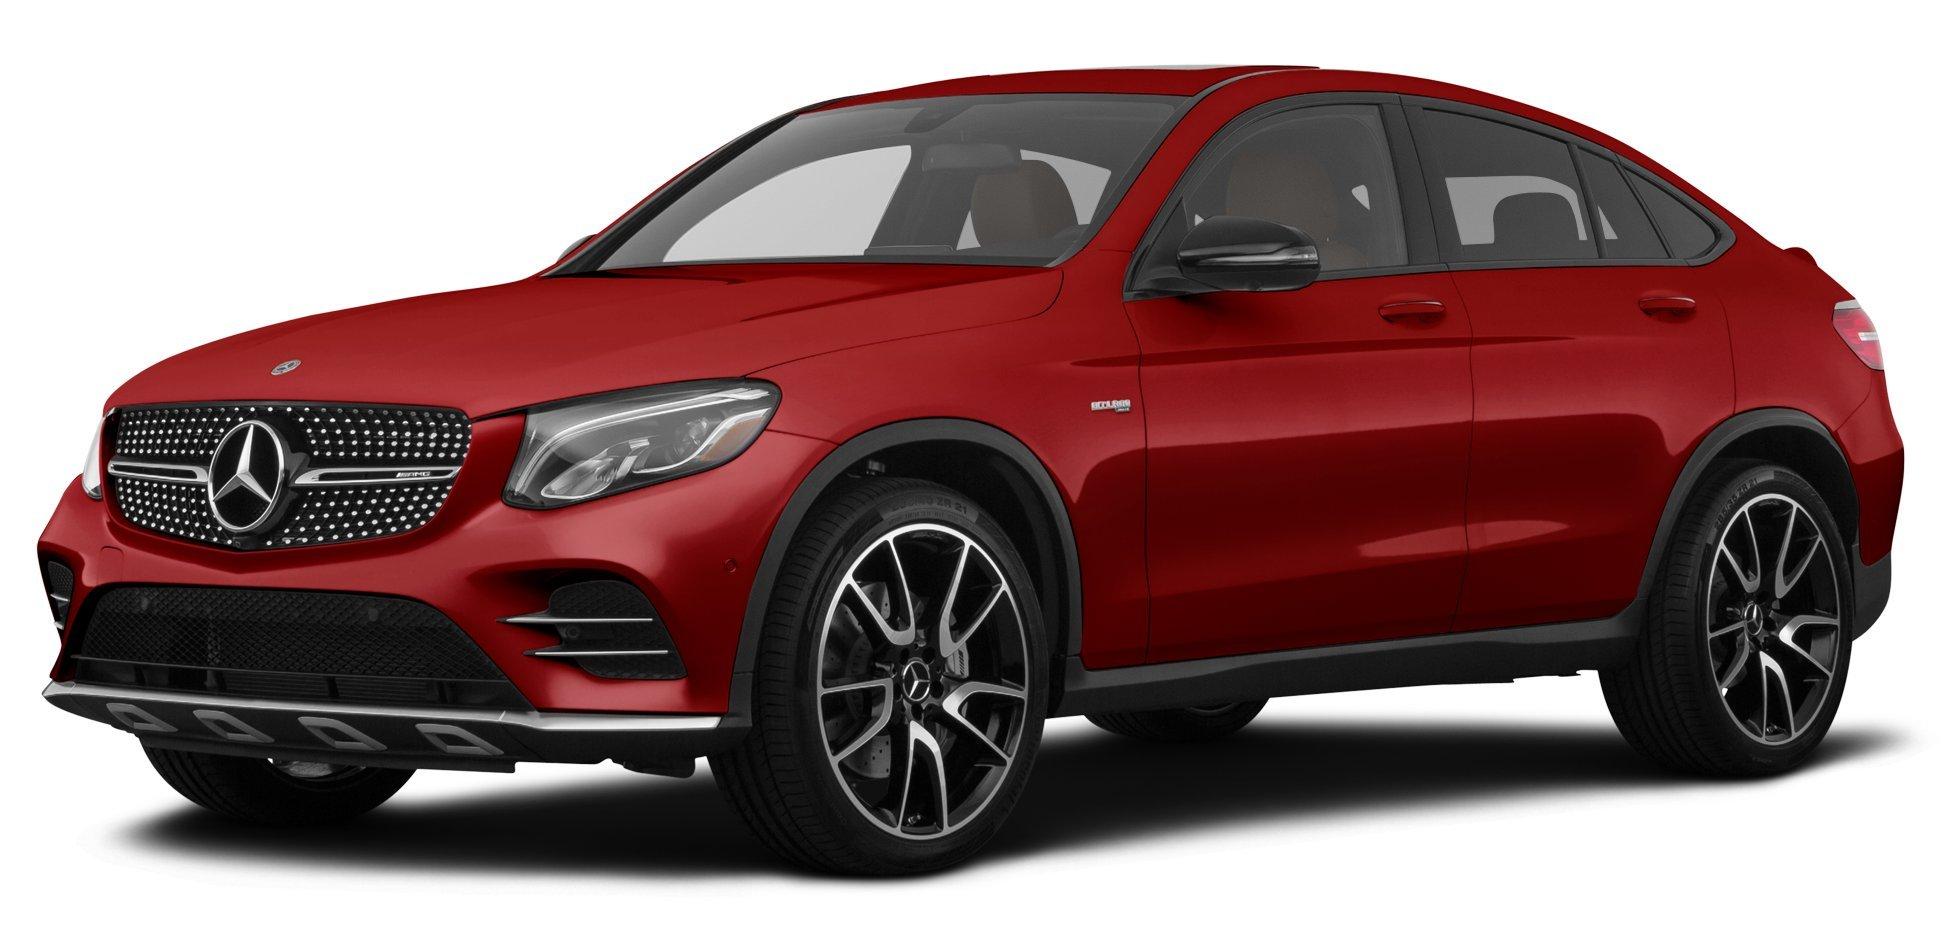 2017 Porsche Cayenne, All Wheel Drive, 2017 Mercedes-Benz GLC43 AMG, 4MATIC Coupe ...